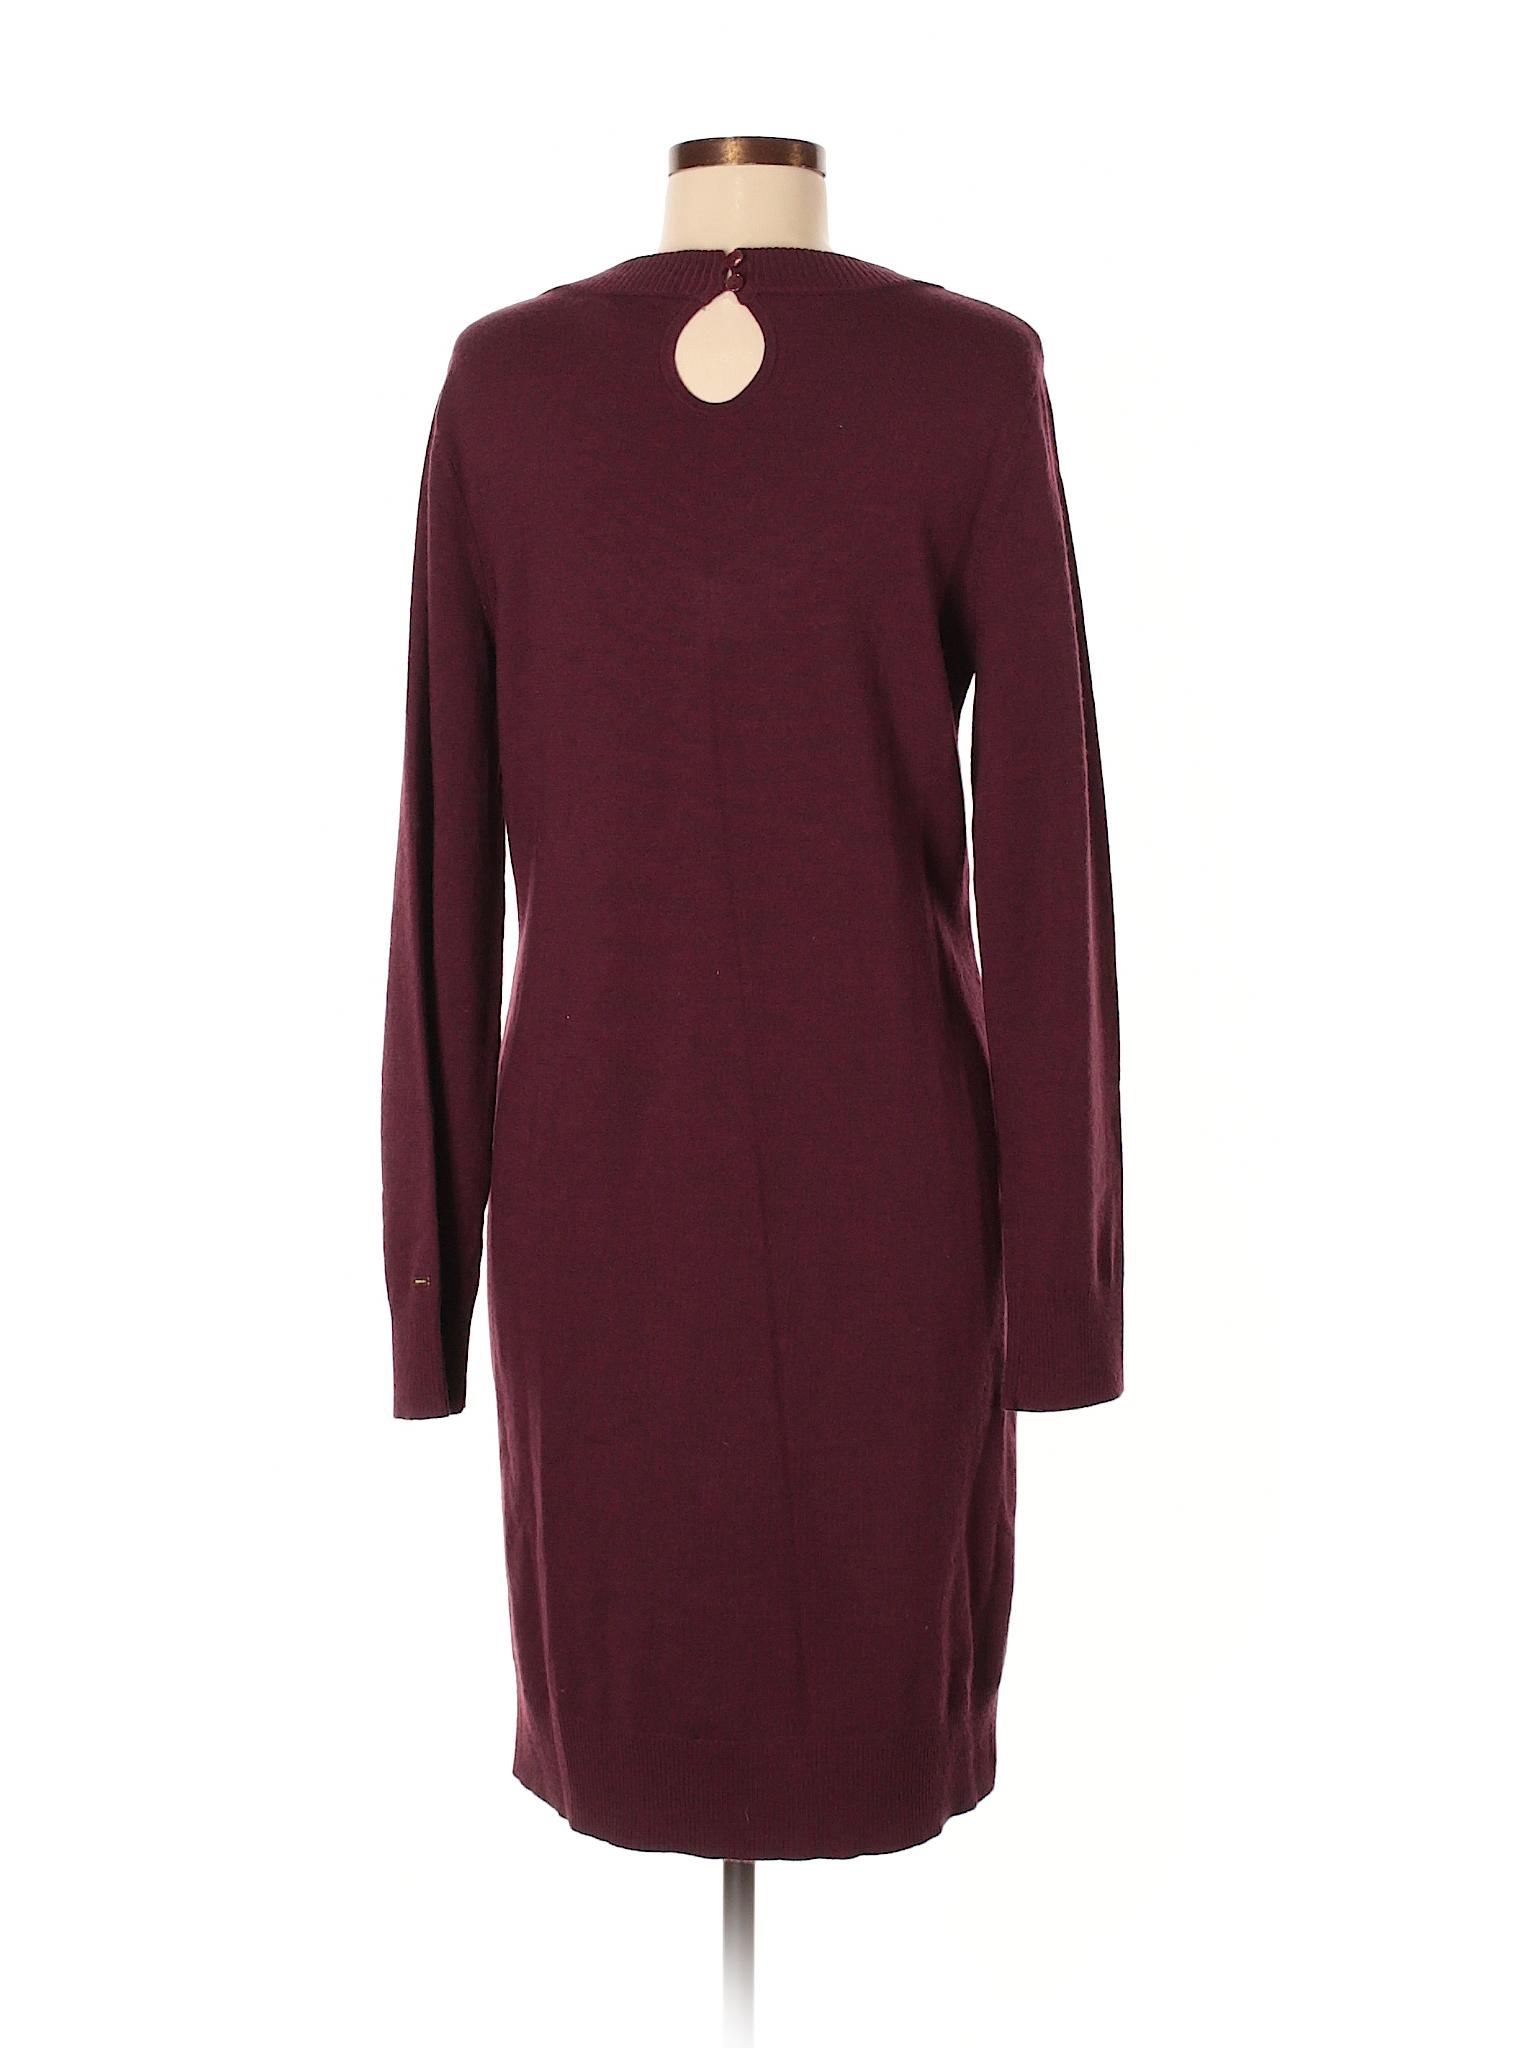 Dress Hilfiger Tommy Boutique Casual winter qgIEUwZ